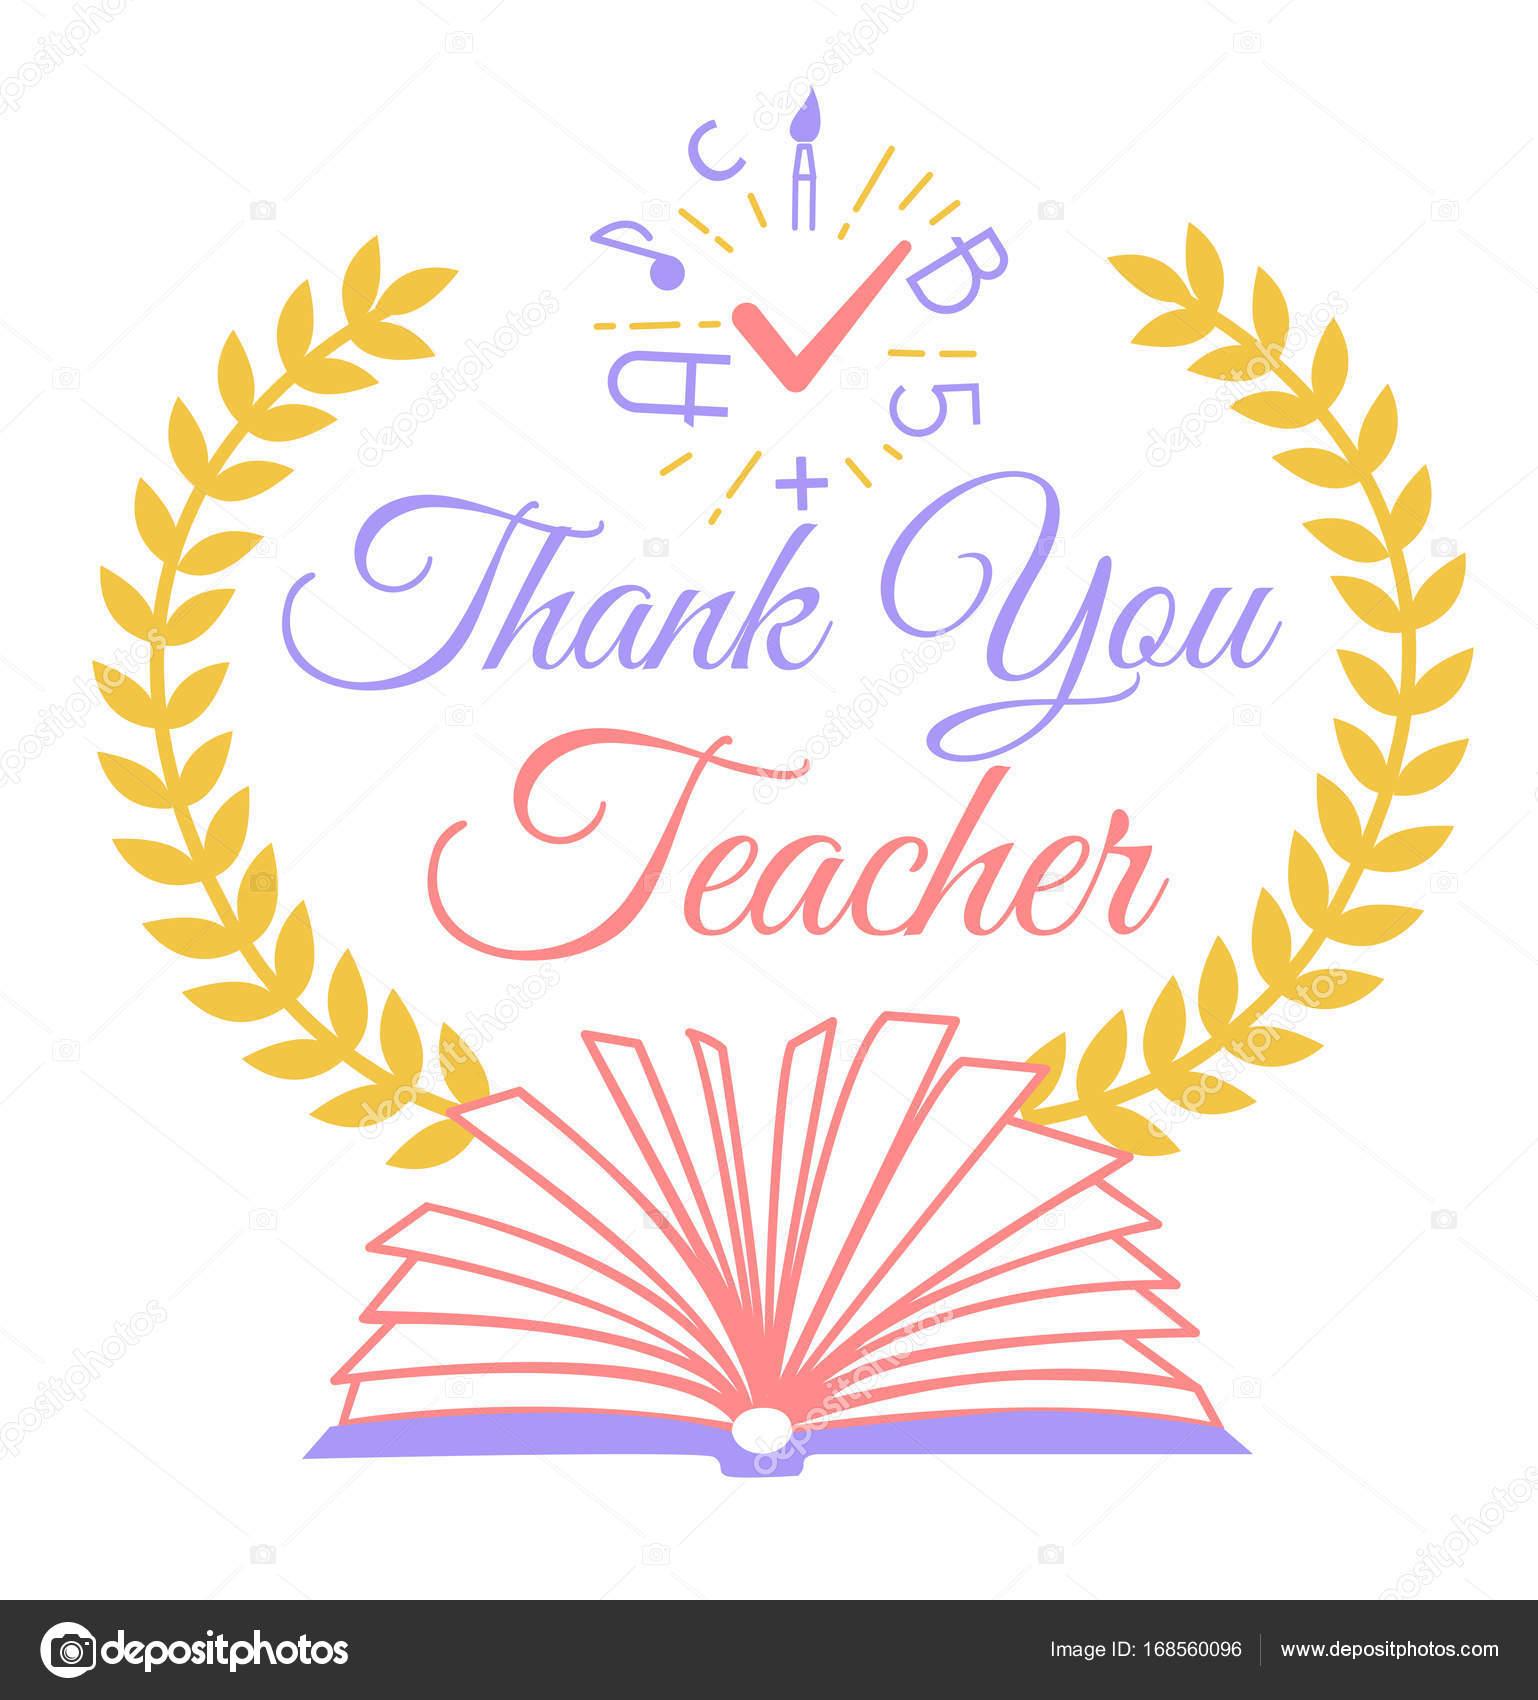 Greeting thank you teacher stock vector rodnikovay1 168560096 greeting thank you teacher stock vector kristyandbryce Choice Image